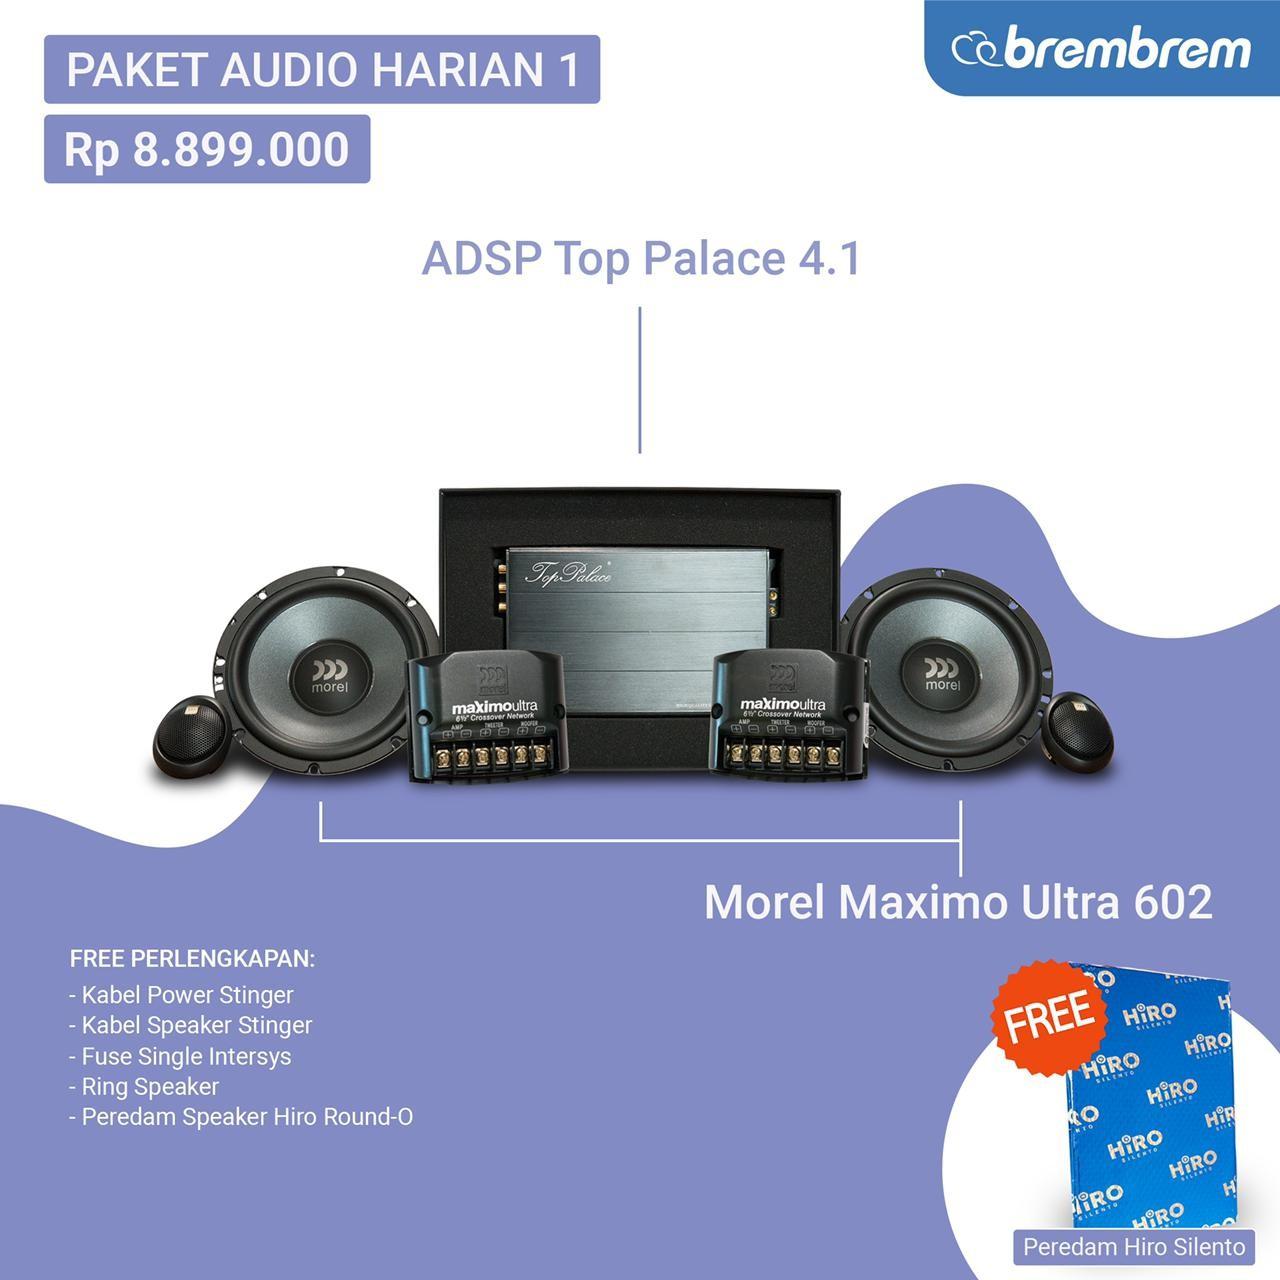 PAKET AUDIO HARIAN 1 - PROMO MENANG BANYAK